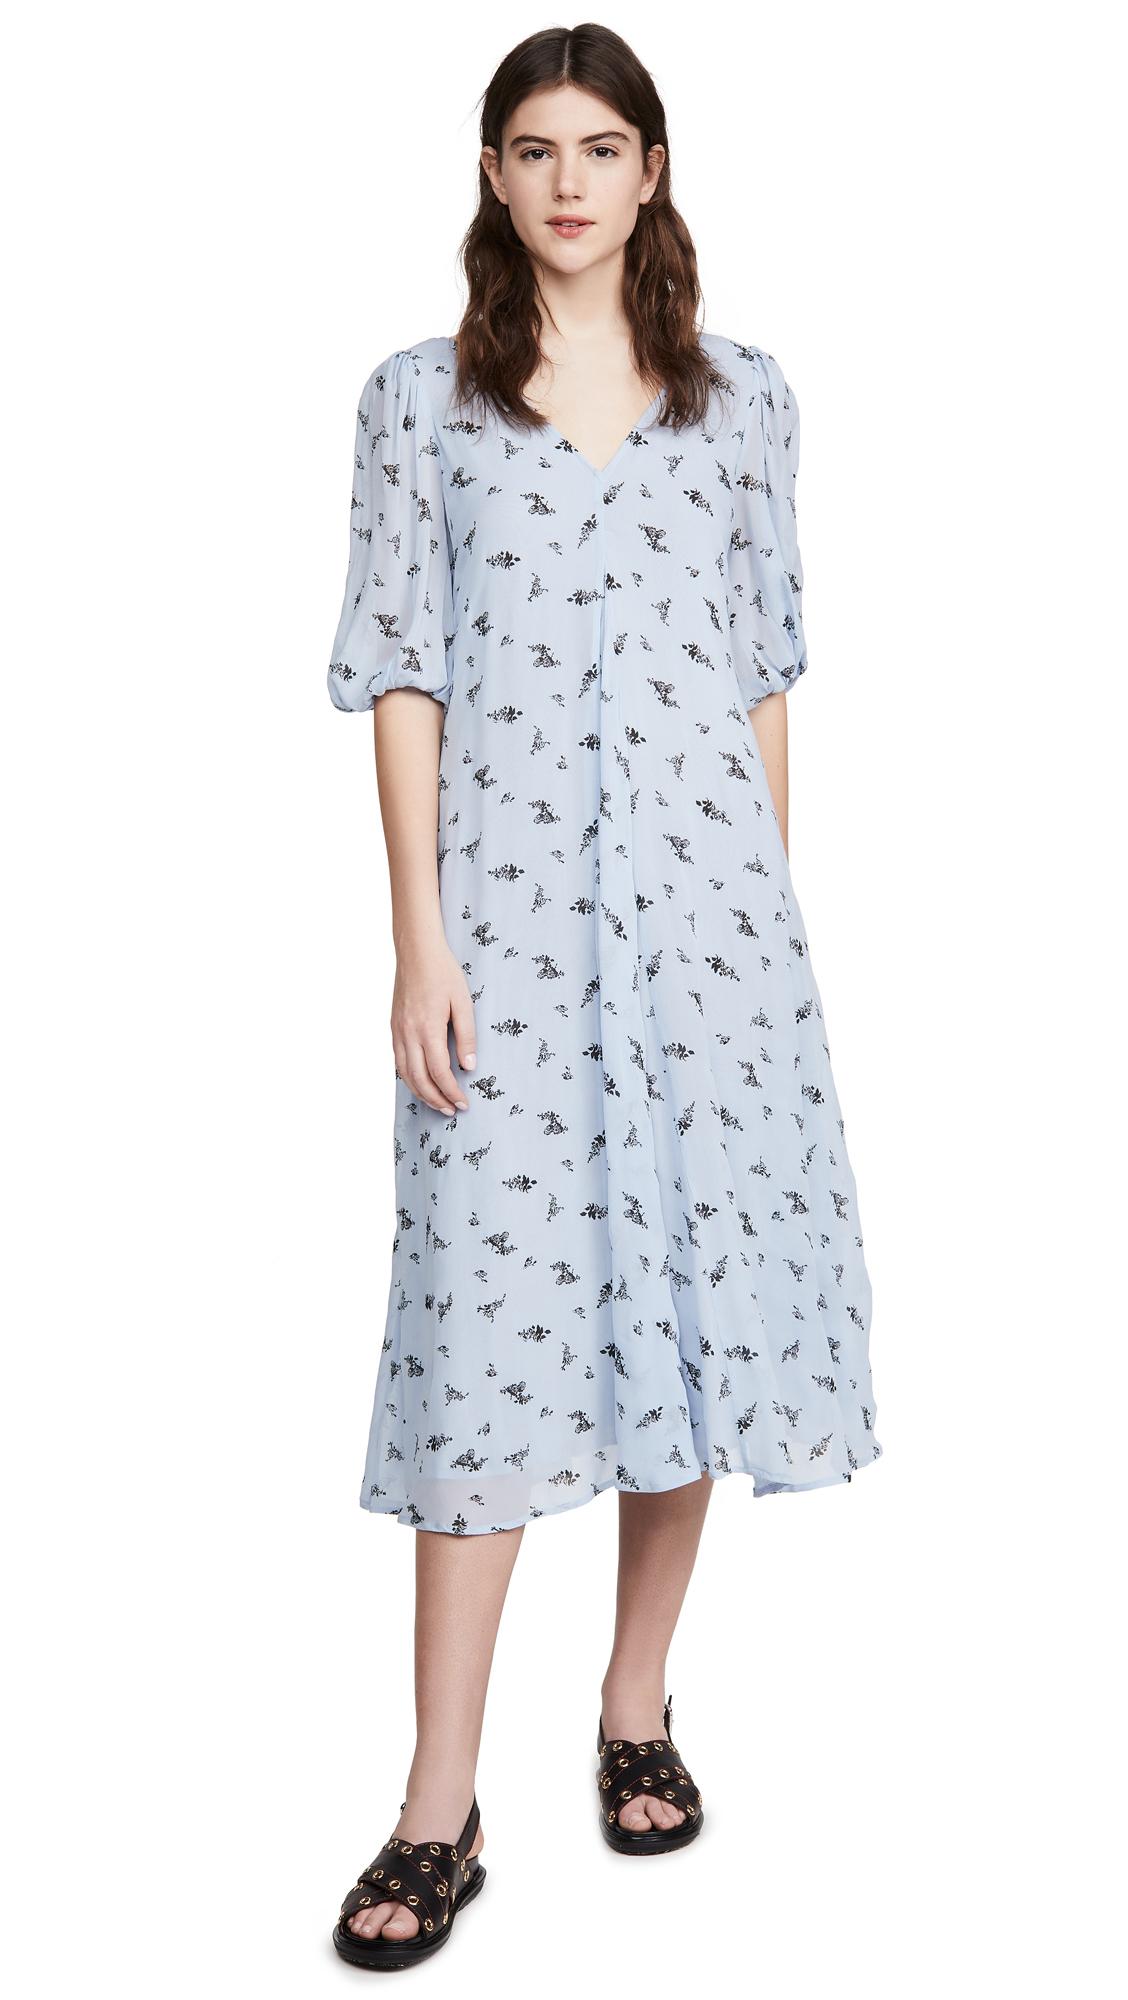 GANNI Printed Georgette Dress - 50% Off Sale